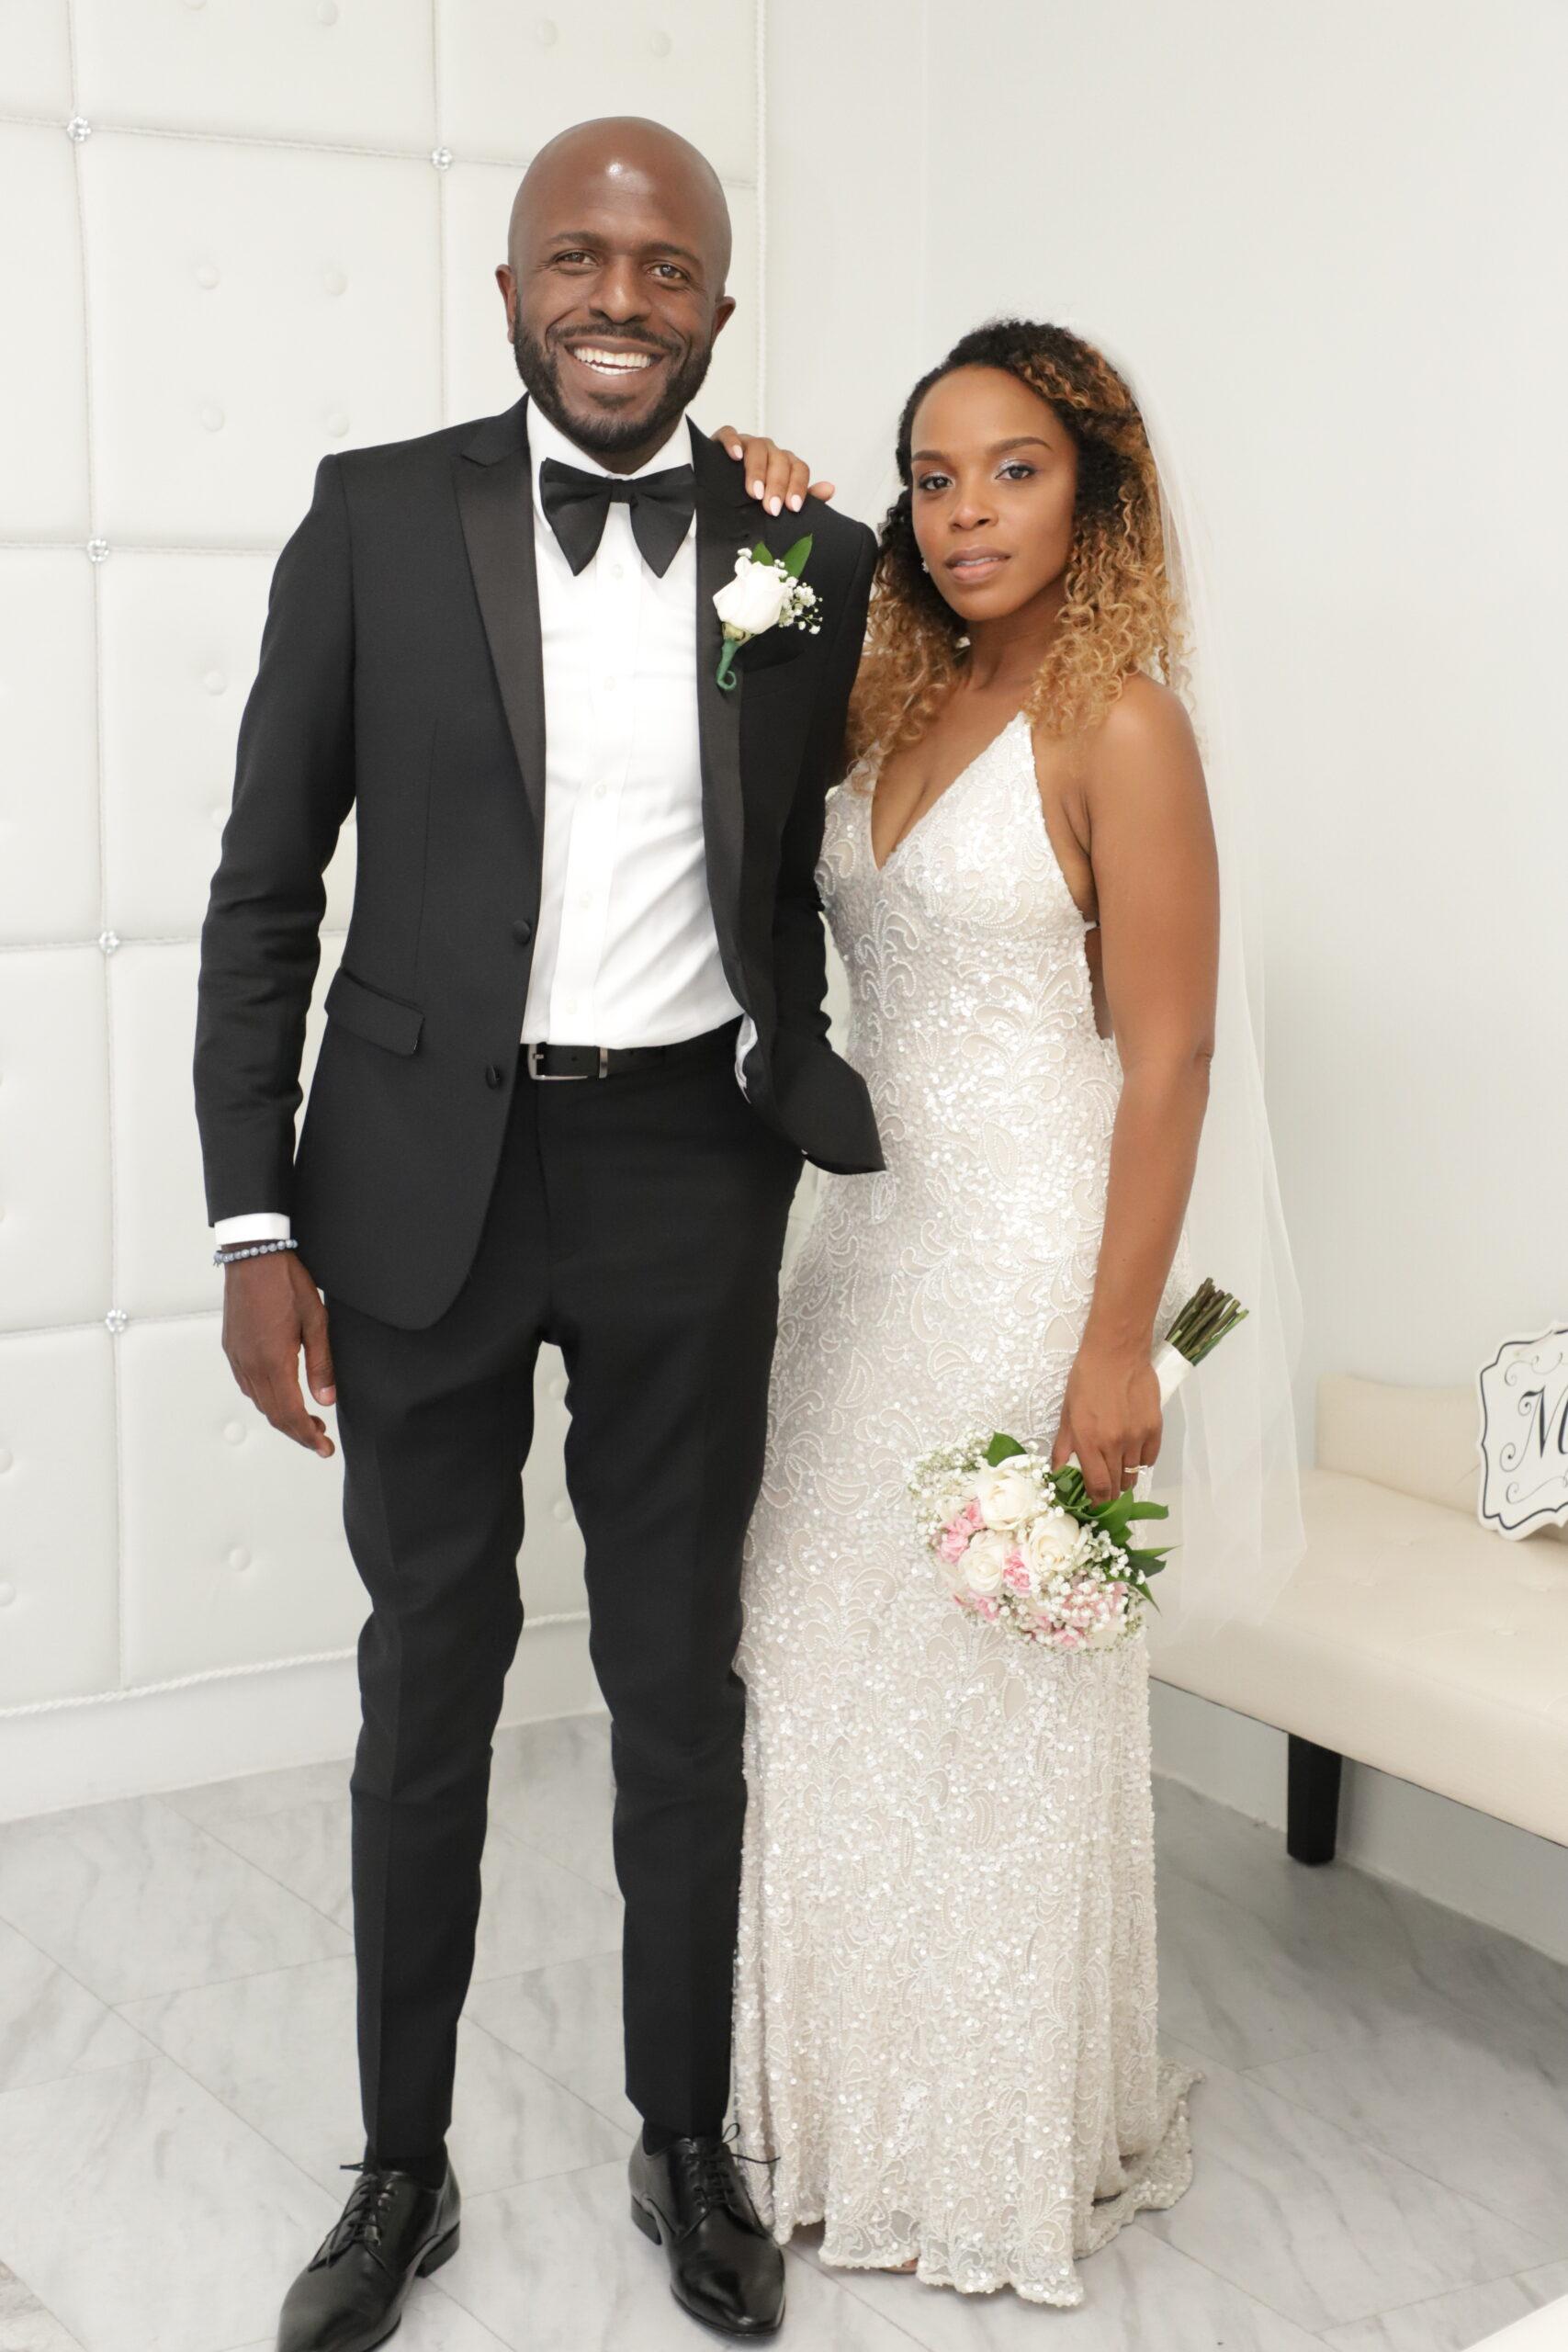 Las Vegas Wedding Chapels PhotoShoot